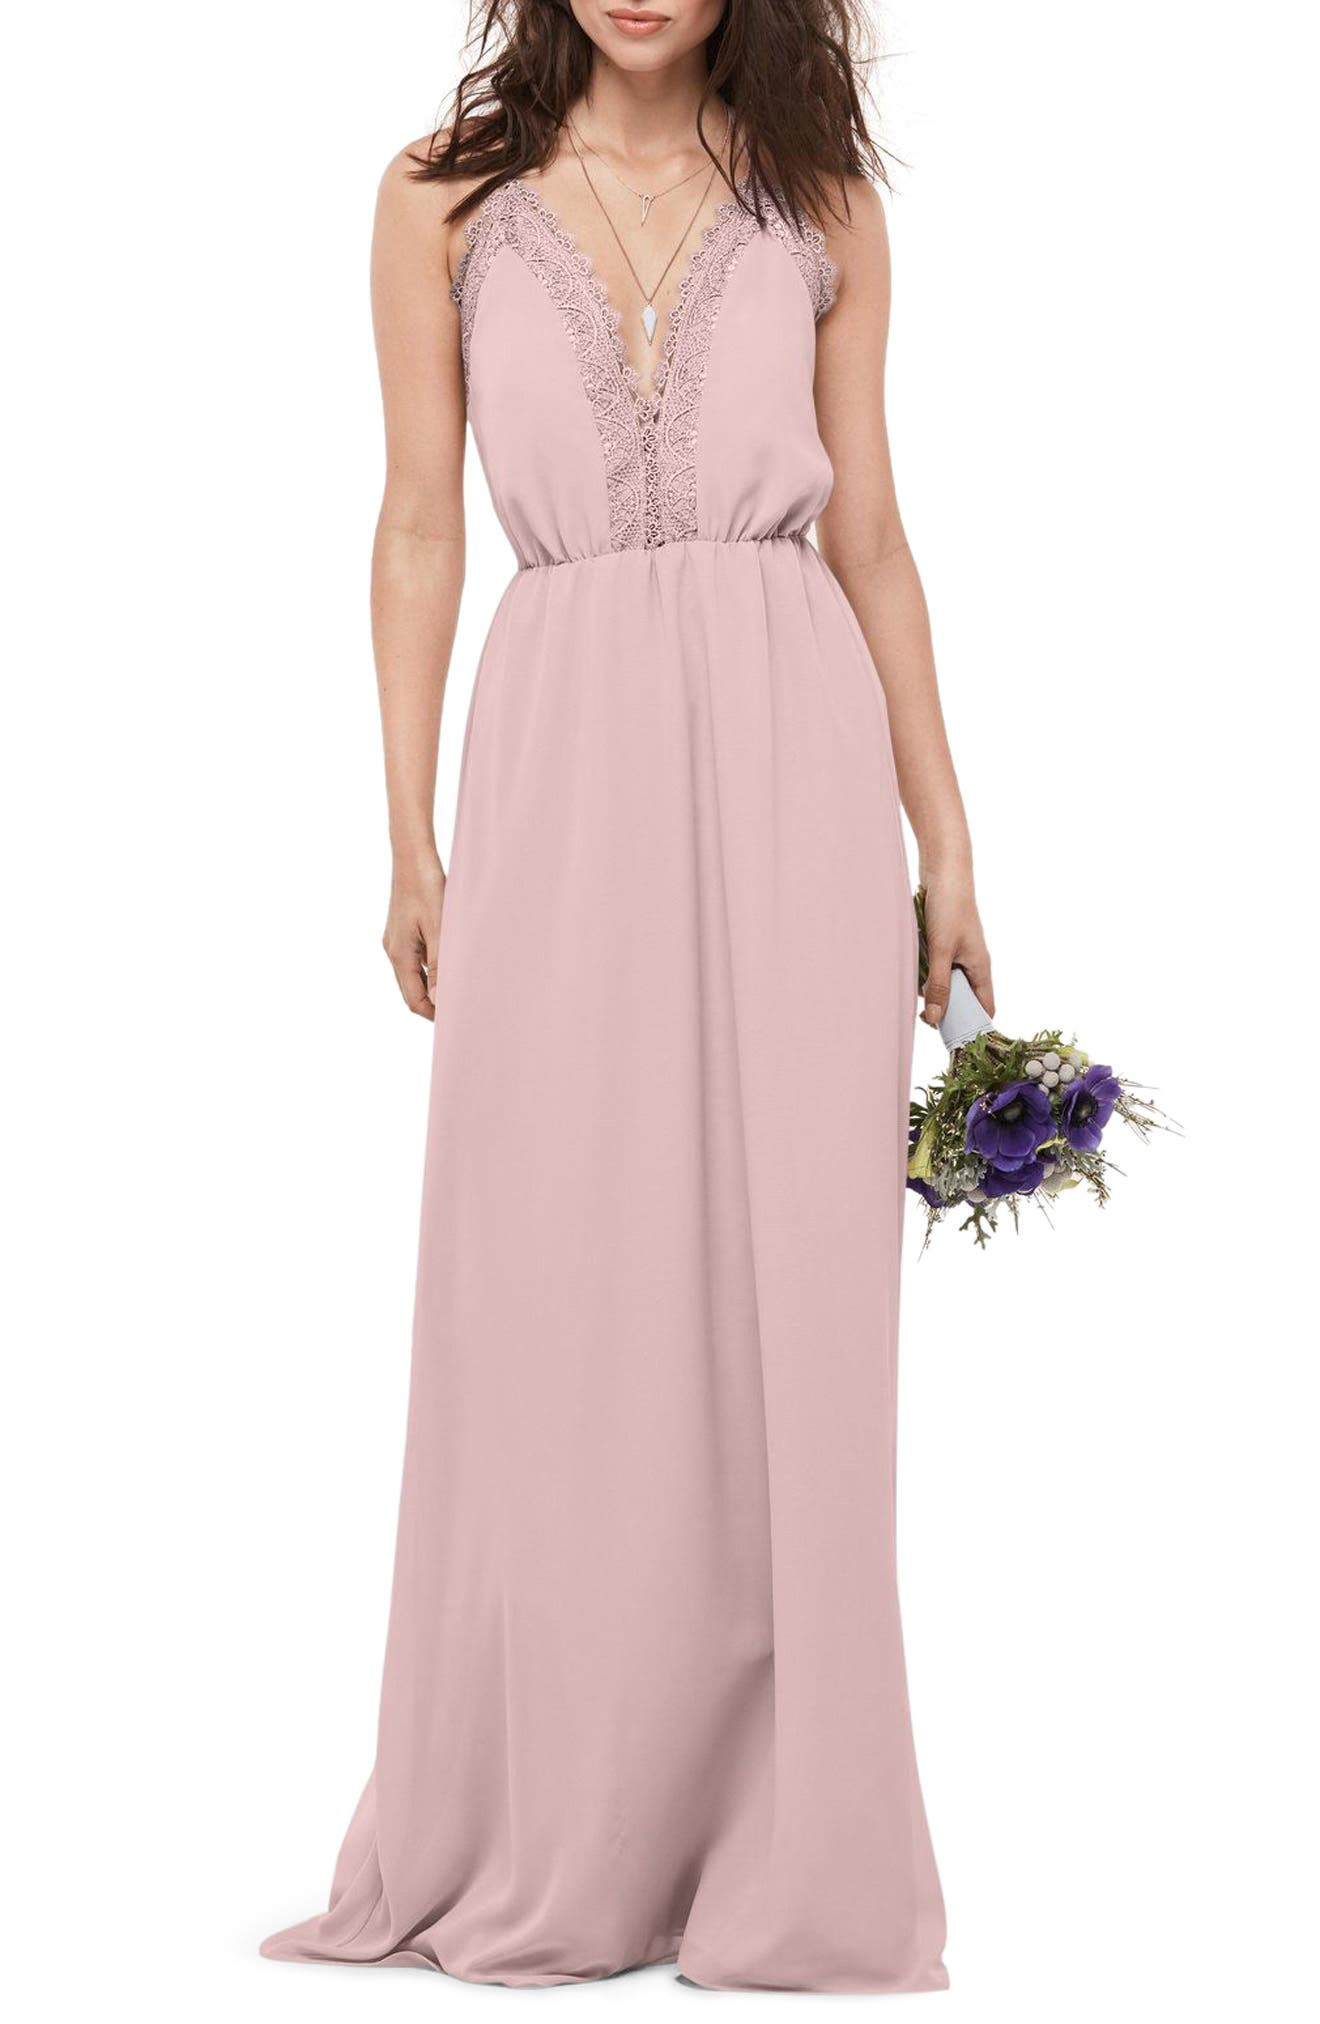 Main Image - WTOO Lace Trim Chiffon Halter Gown